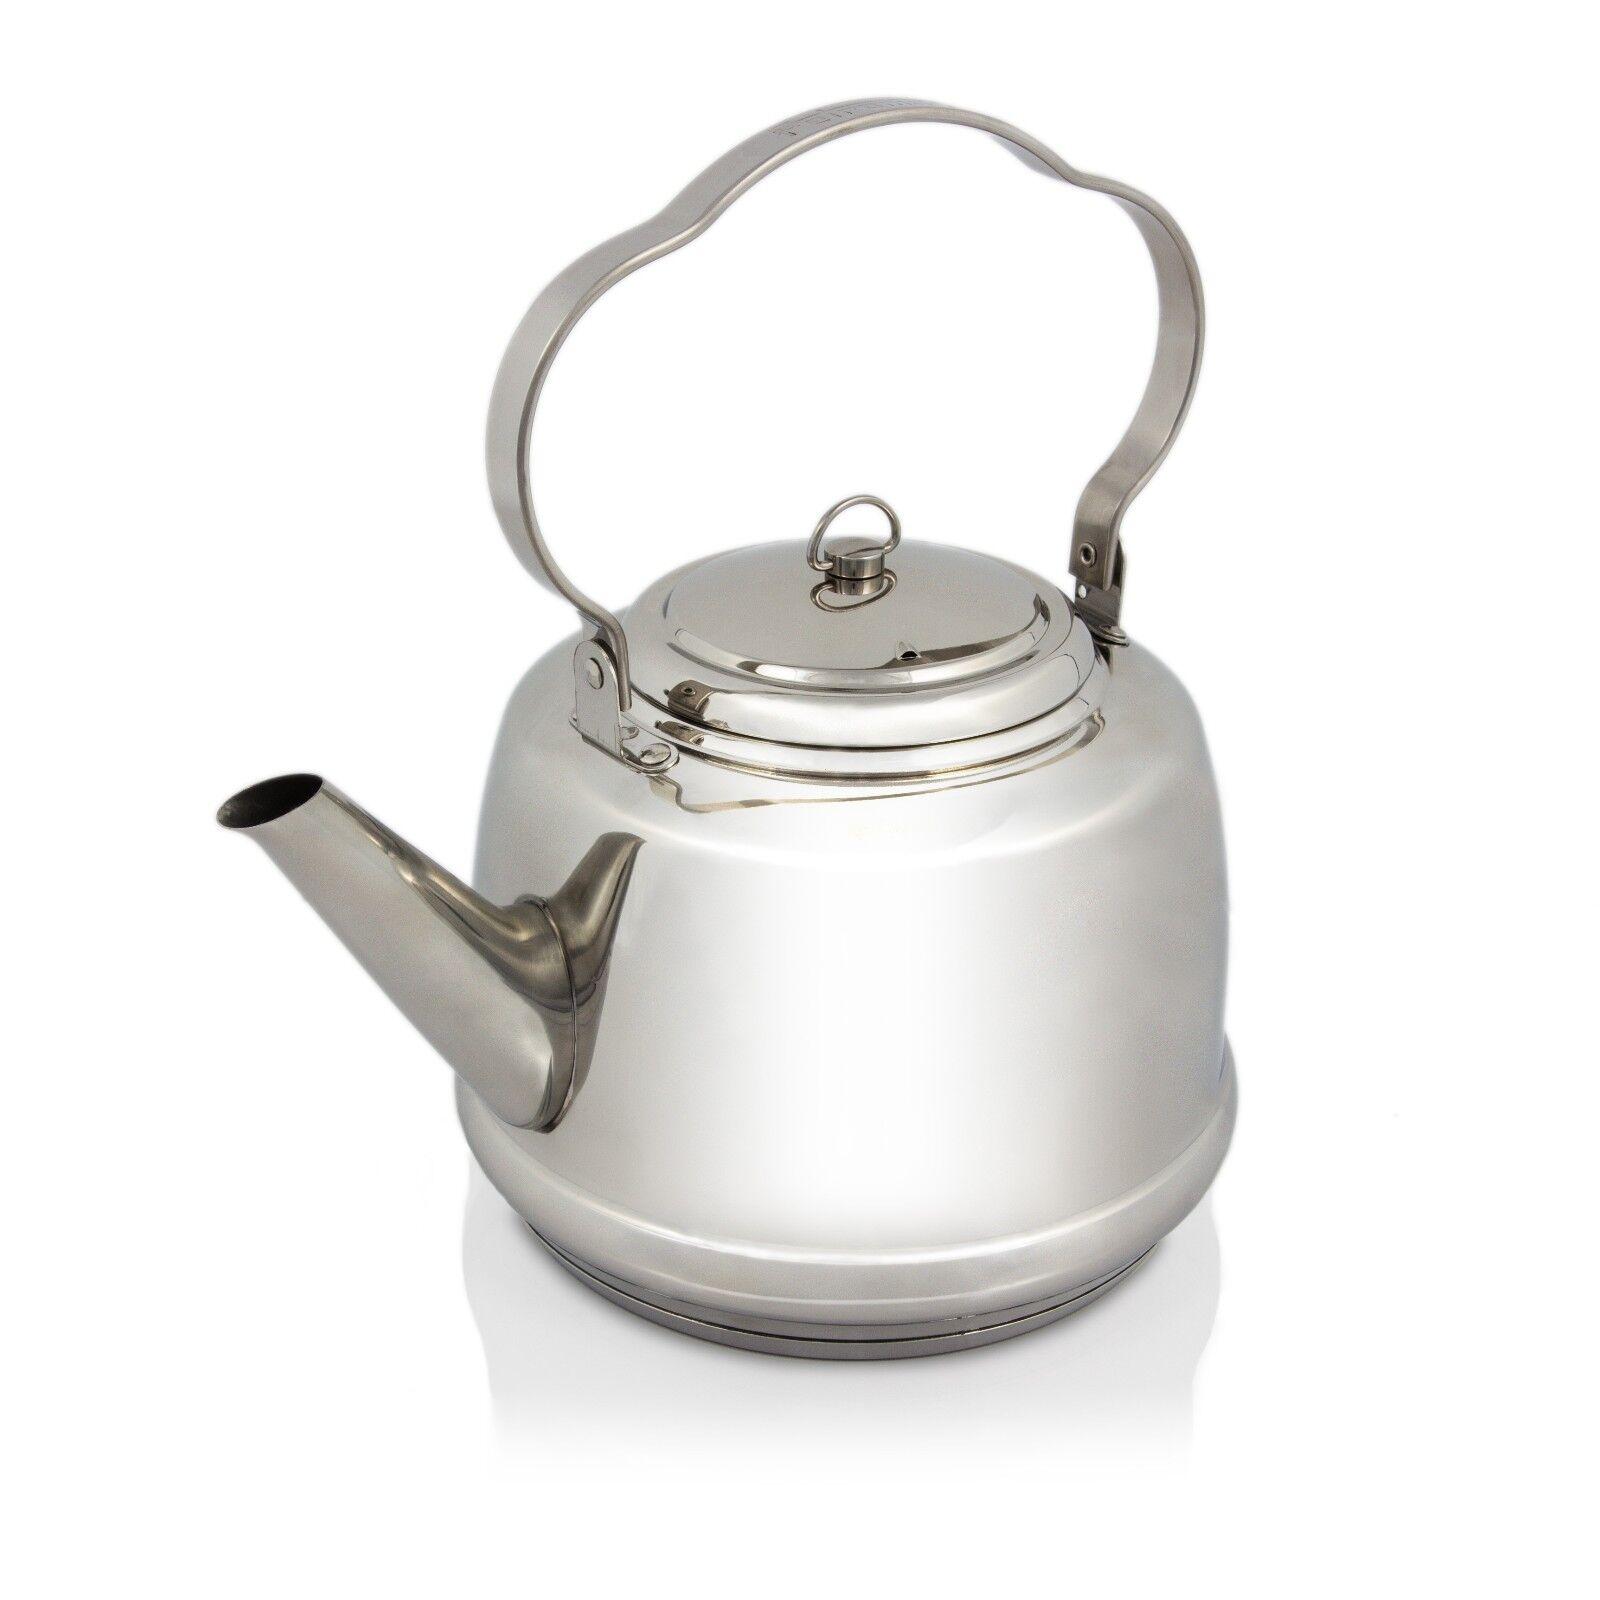 Petromax Teekessel Edelstahl - tk 1, 1,5 L  | Die Königin Der Qualität